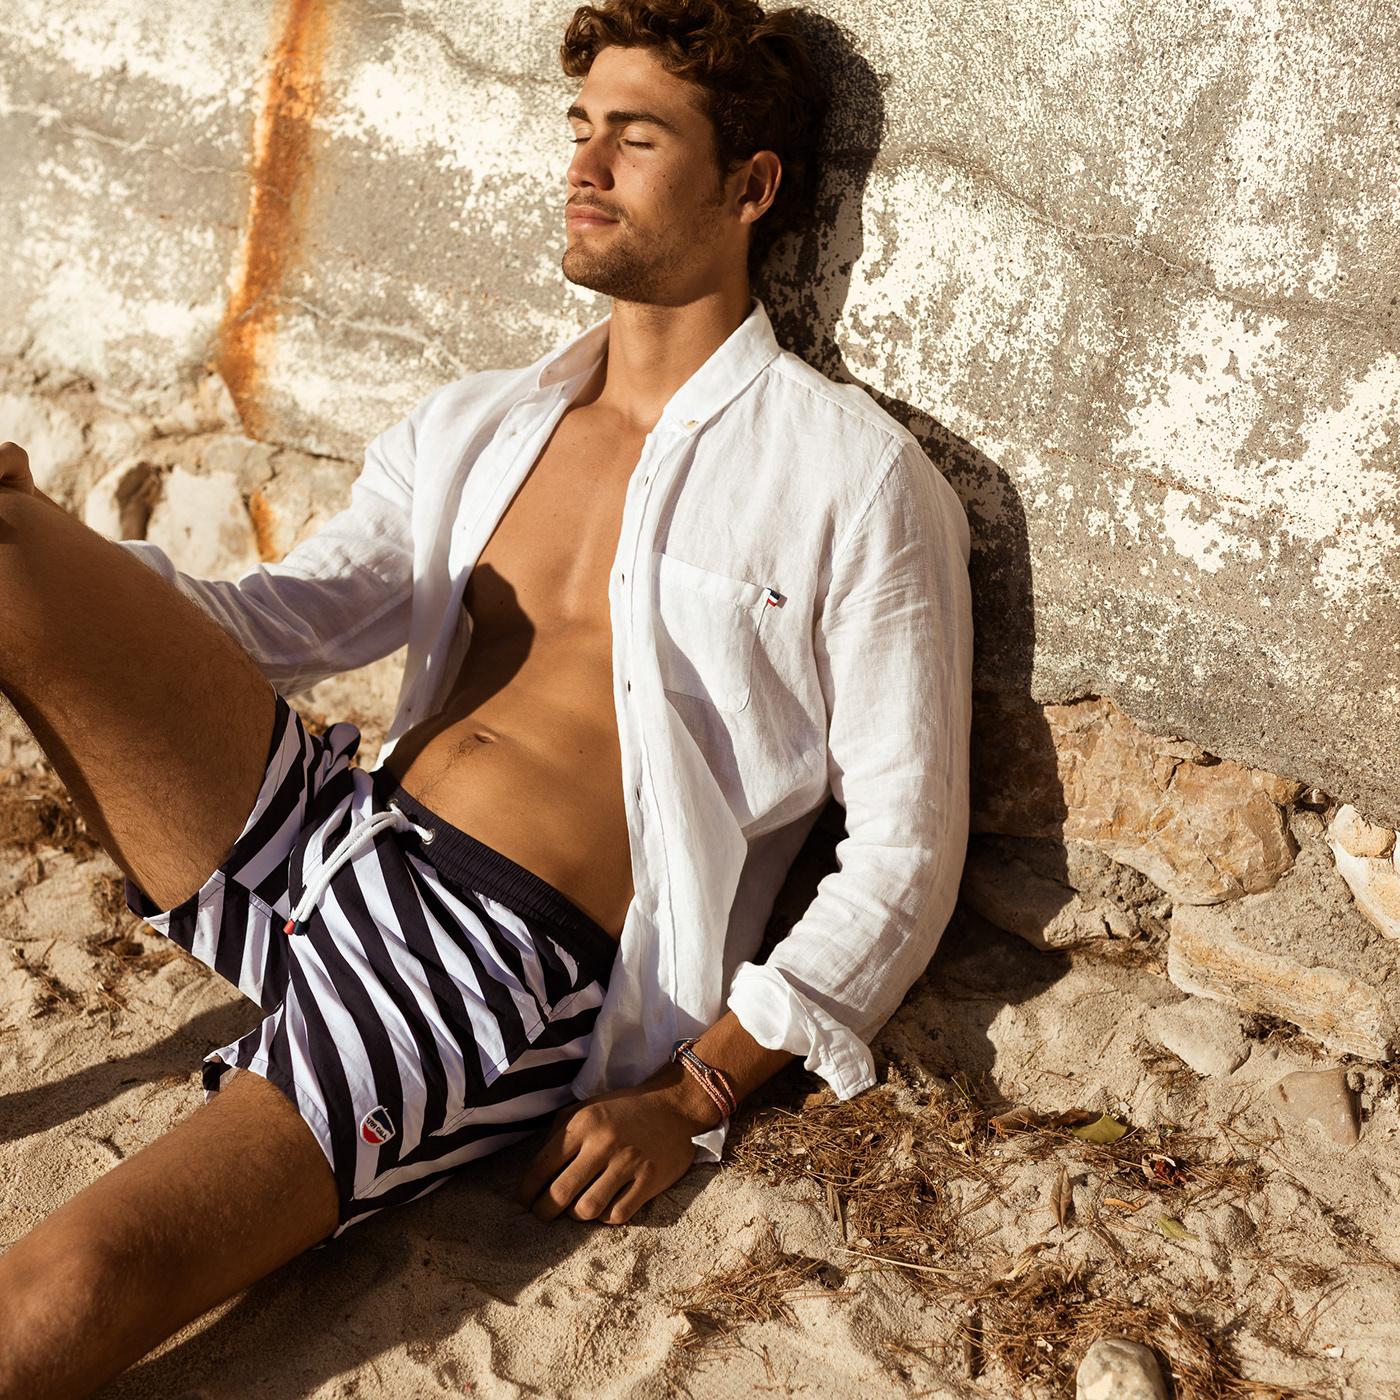 summer swimwear Riviera swimsuit male model SS19 campaign